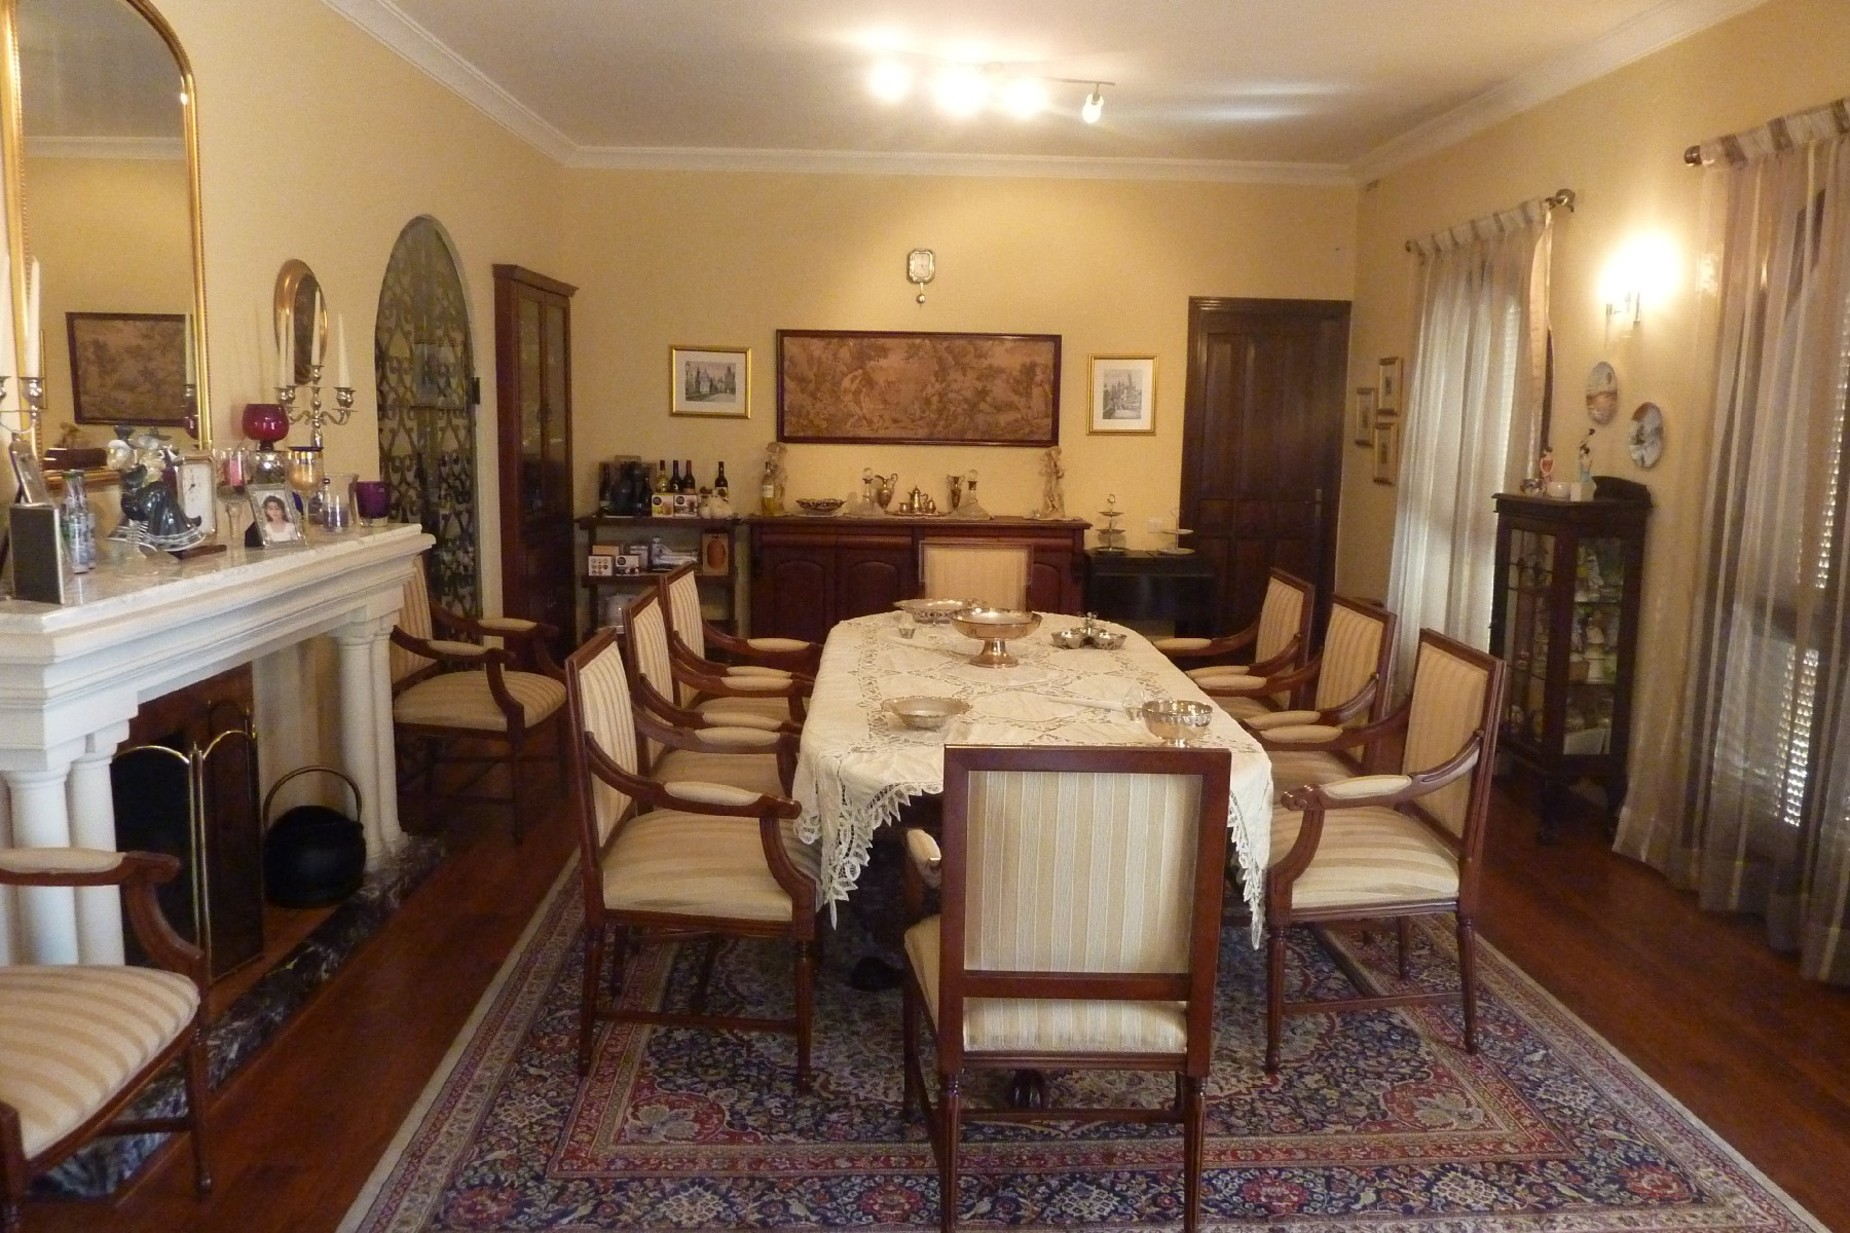 4 bed Villa For Sale in Gzira, Gzira - thumb 7